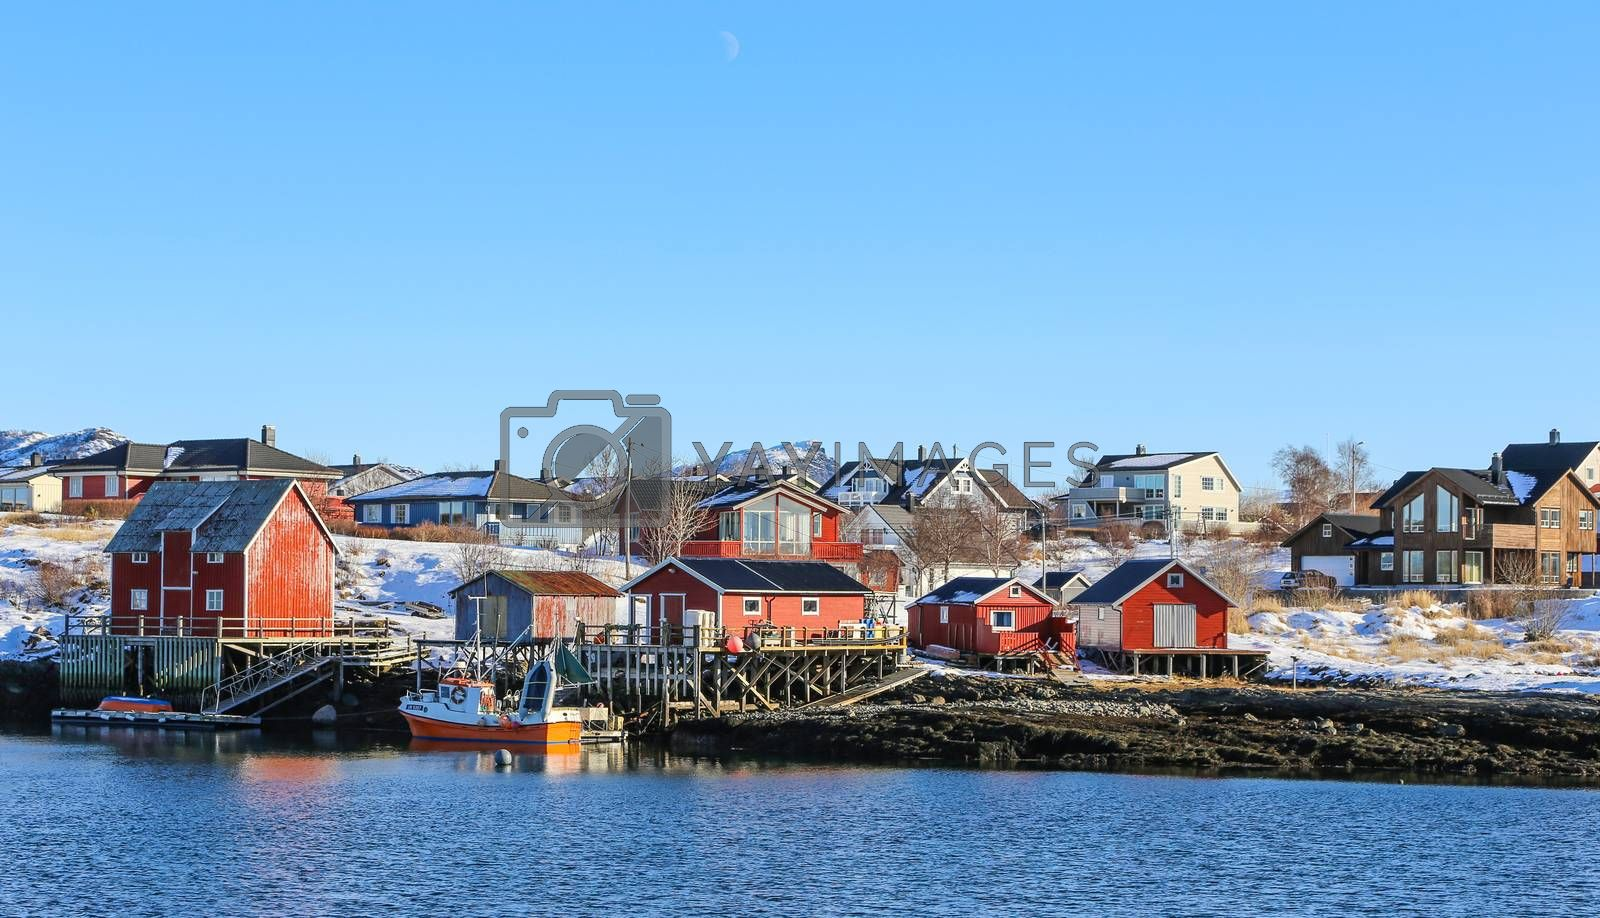 Fiskerens hus by post@bronn.no